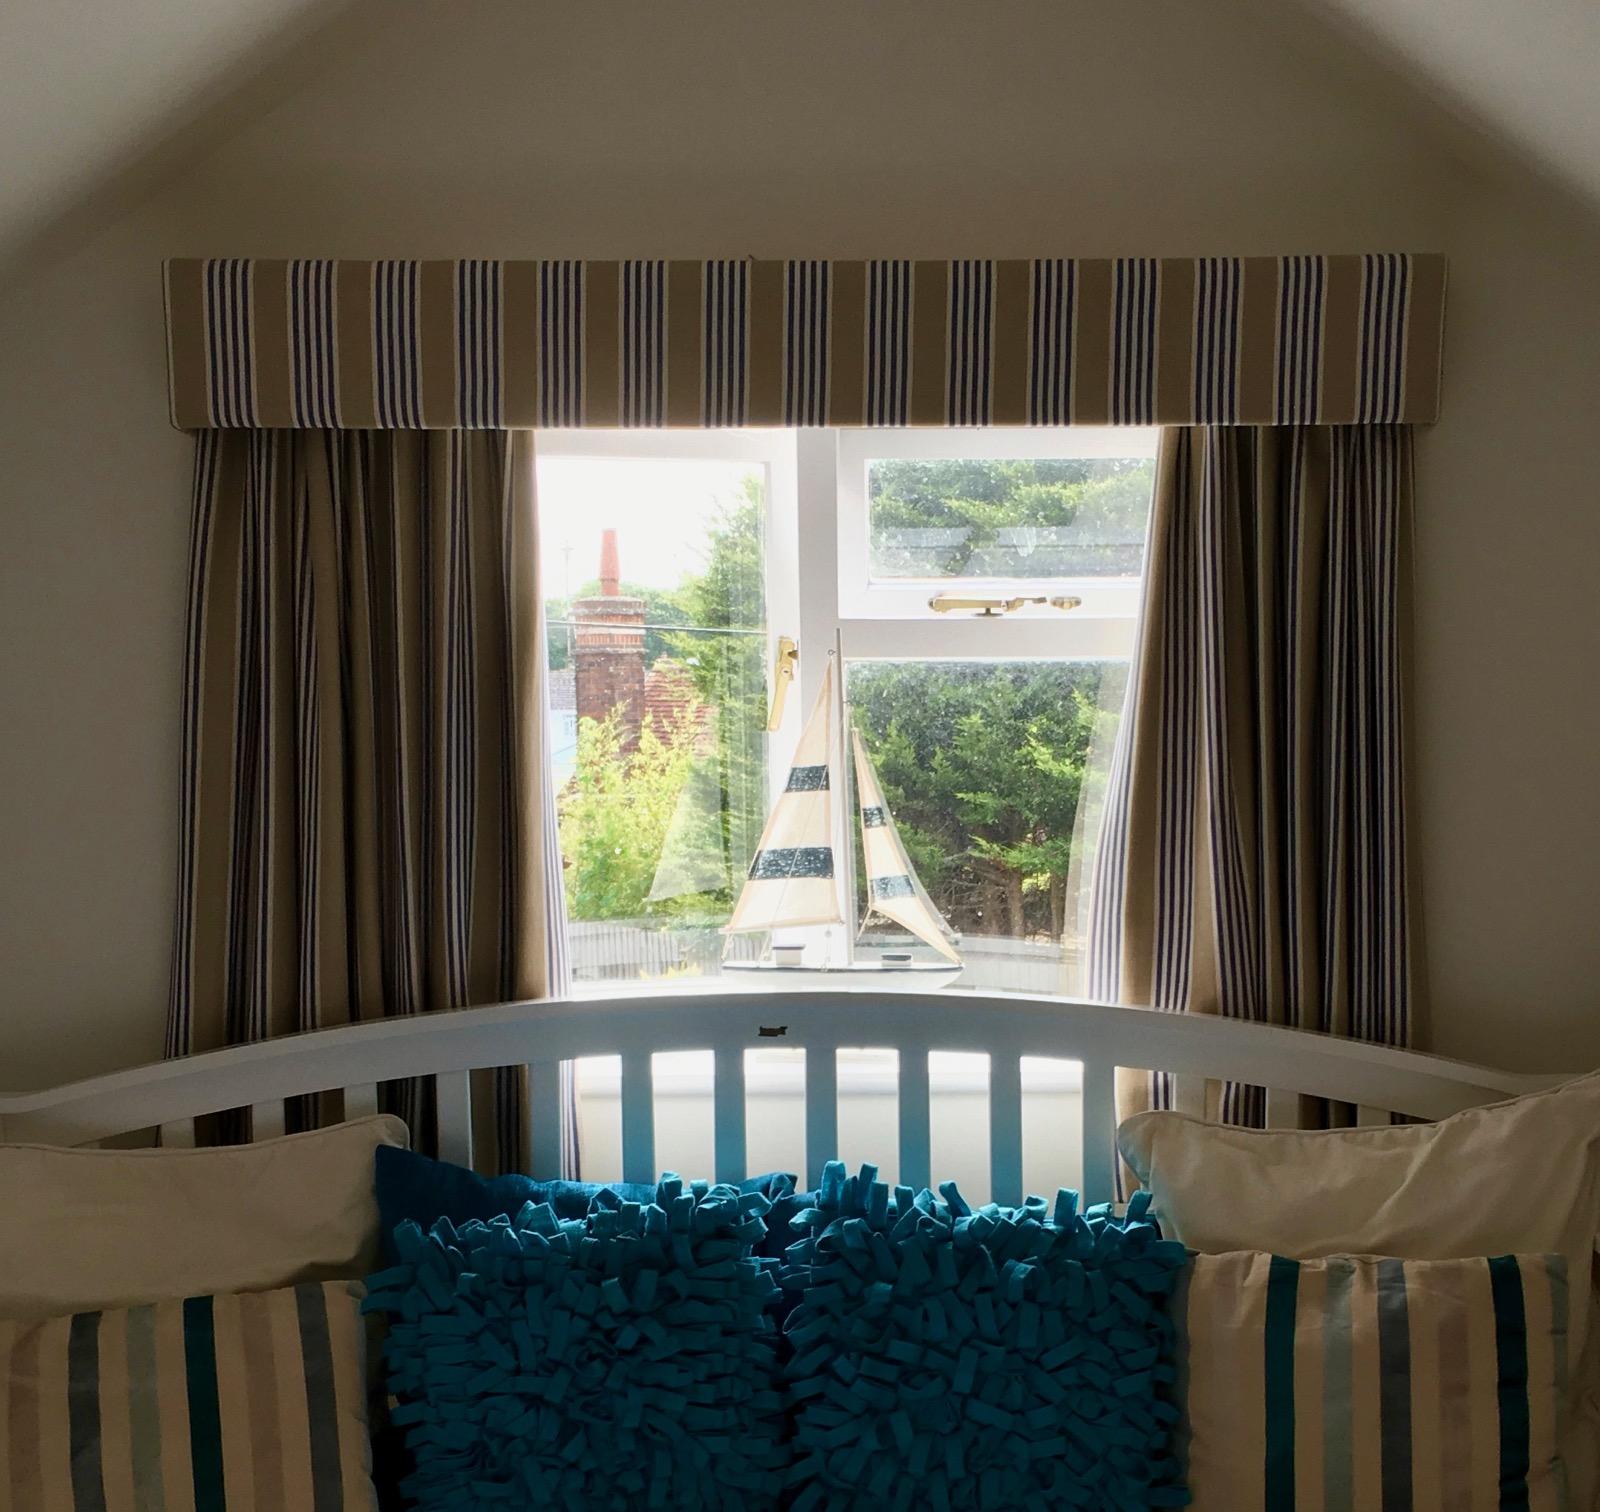 The Fishbourne Ryde King Room